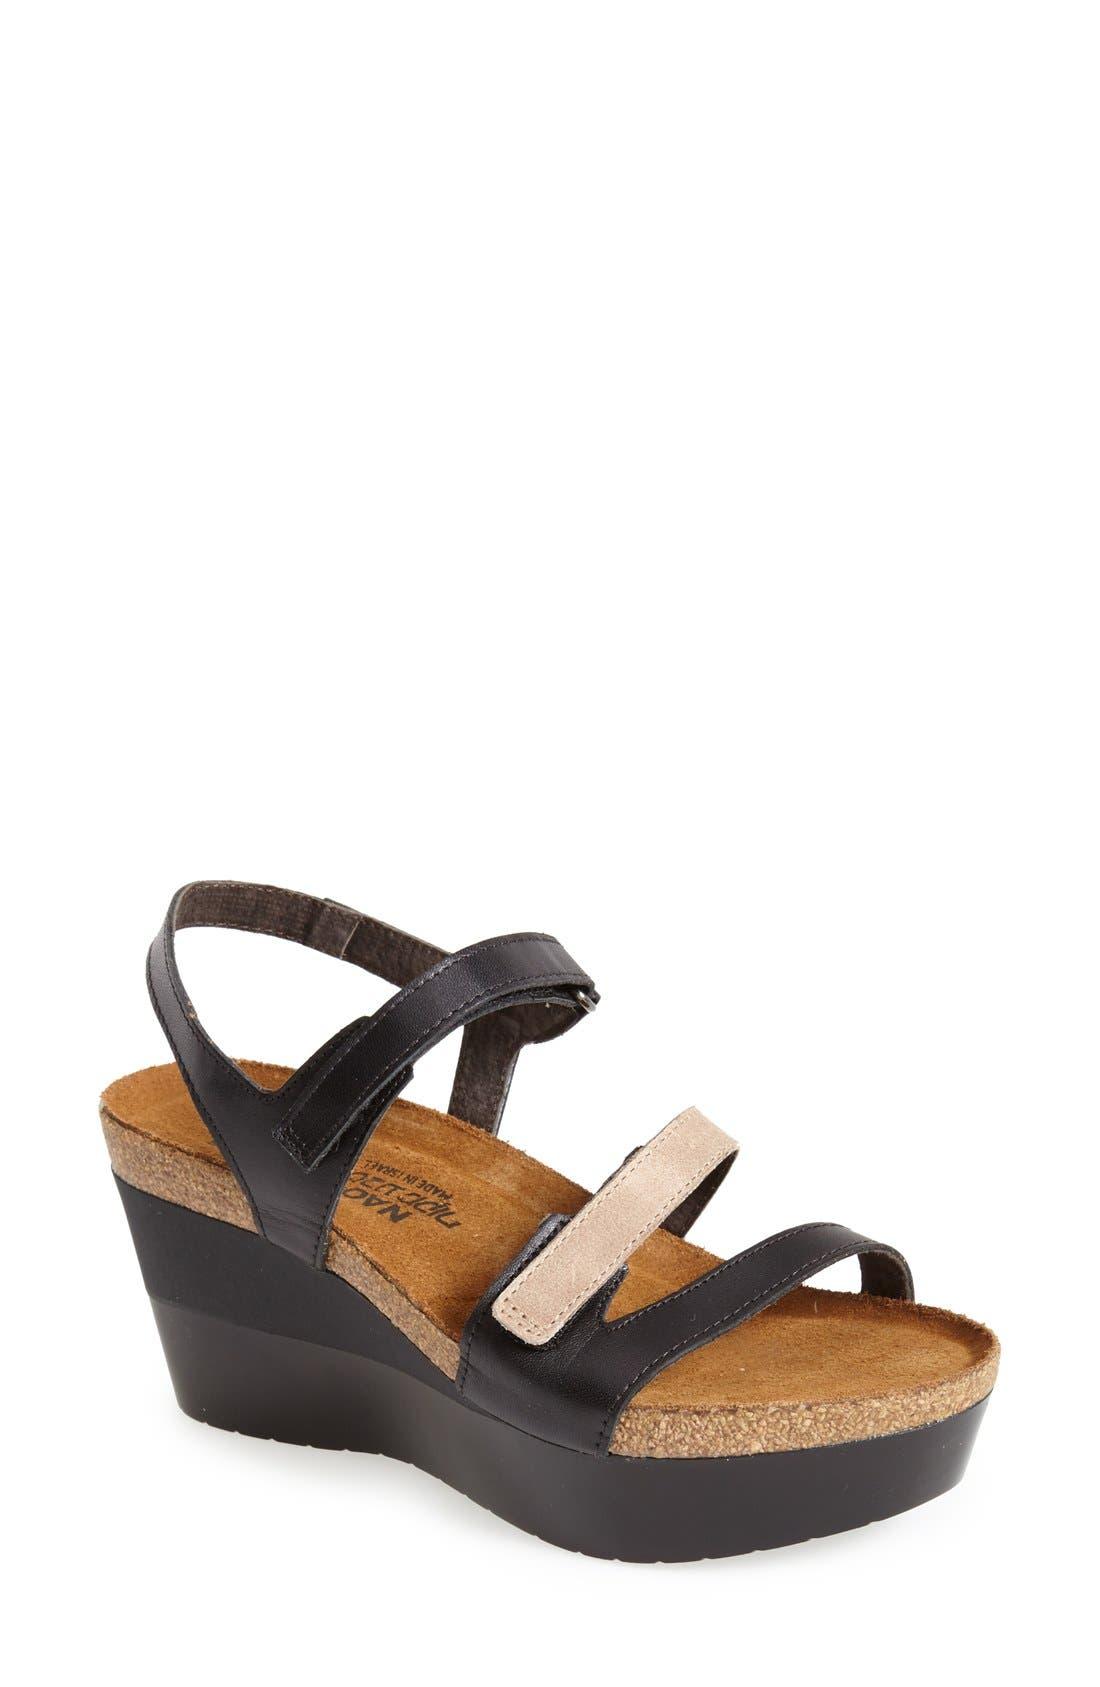 'Canaan' Wedge Sandal,                             Main thumbnail 1, color,                             Black/ Beige